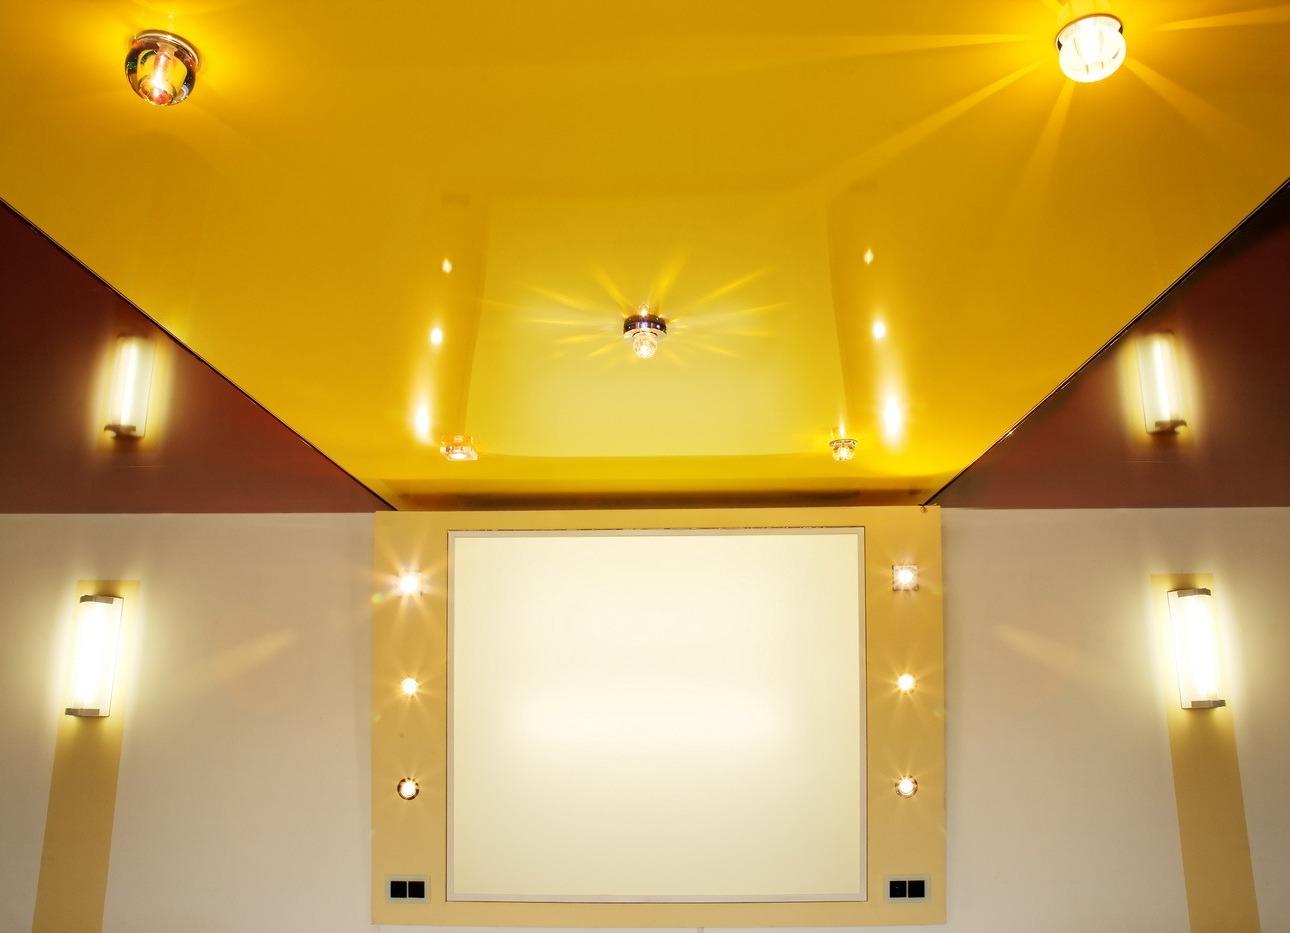 потолок ремонт картинки проекты